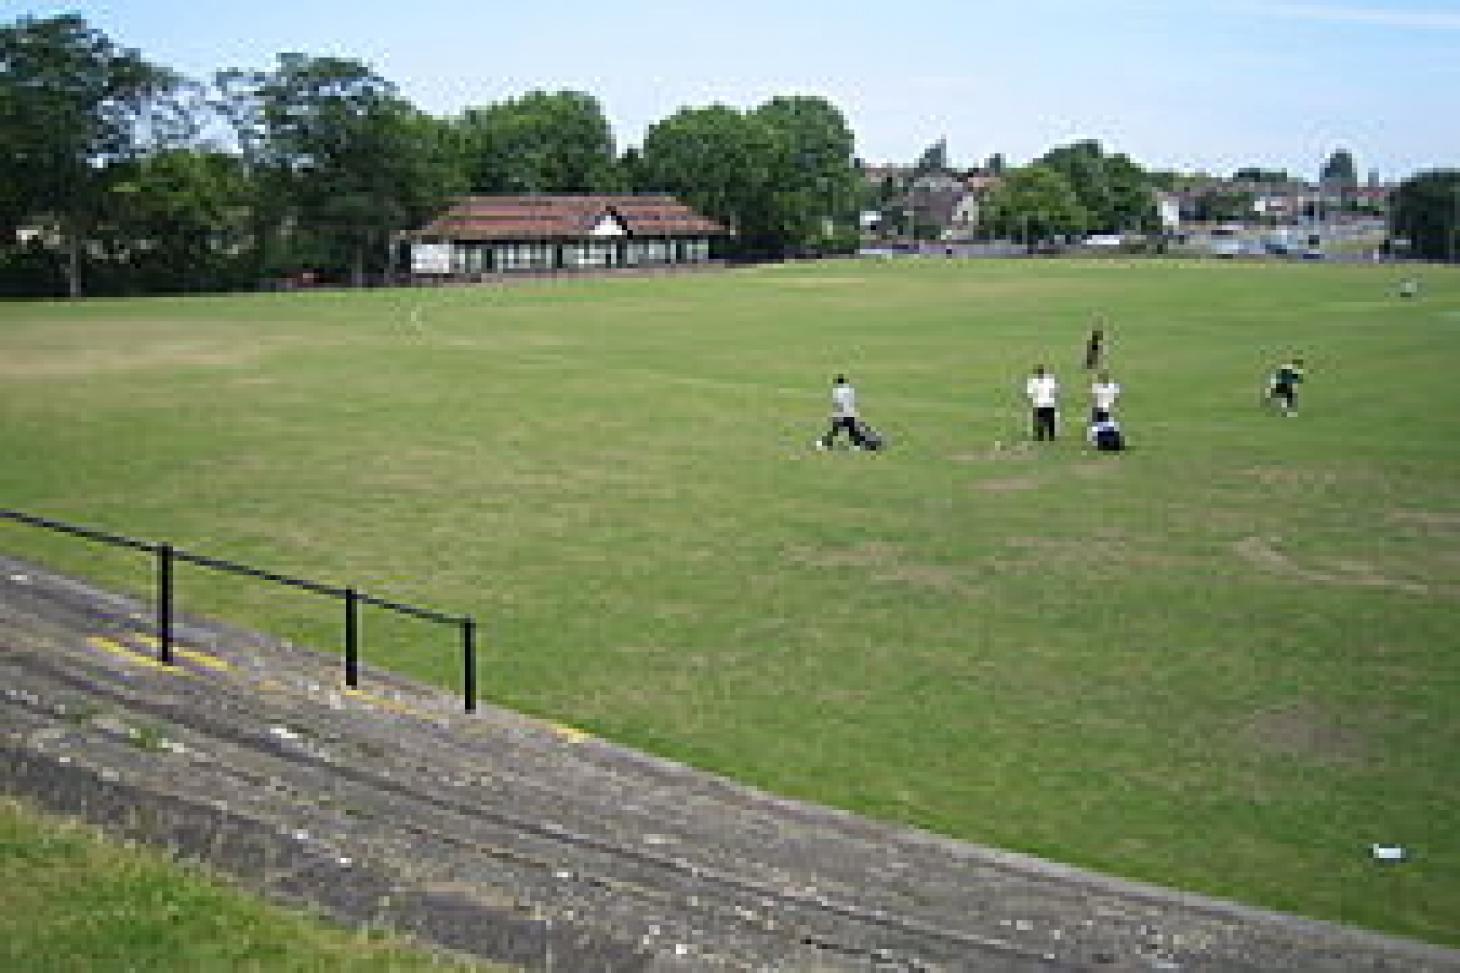 Wardown Park Full size | Grass cricket facilities